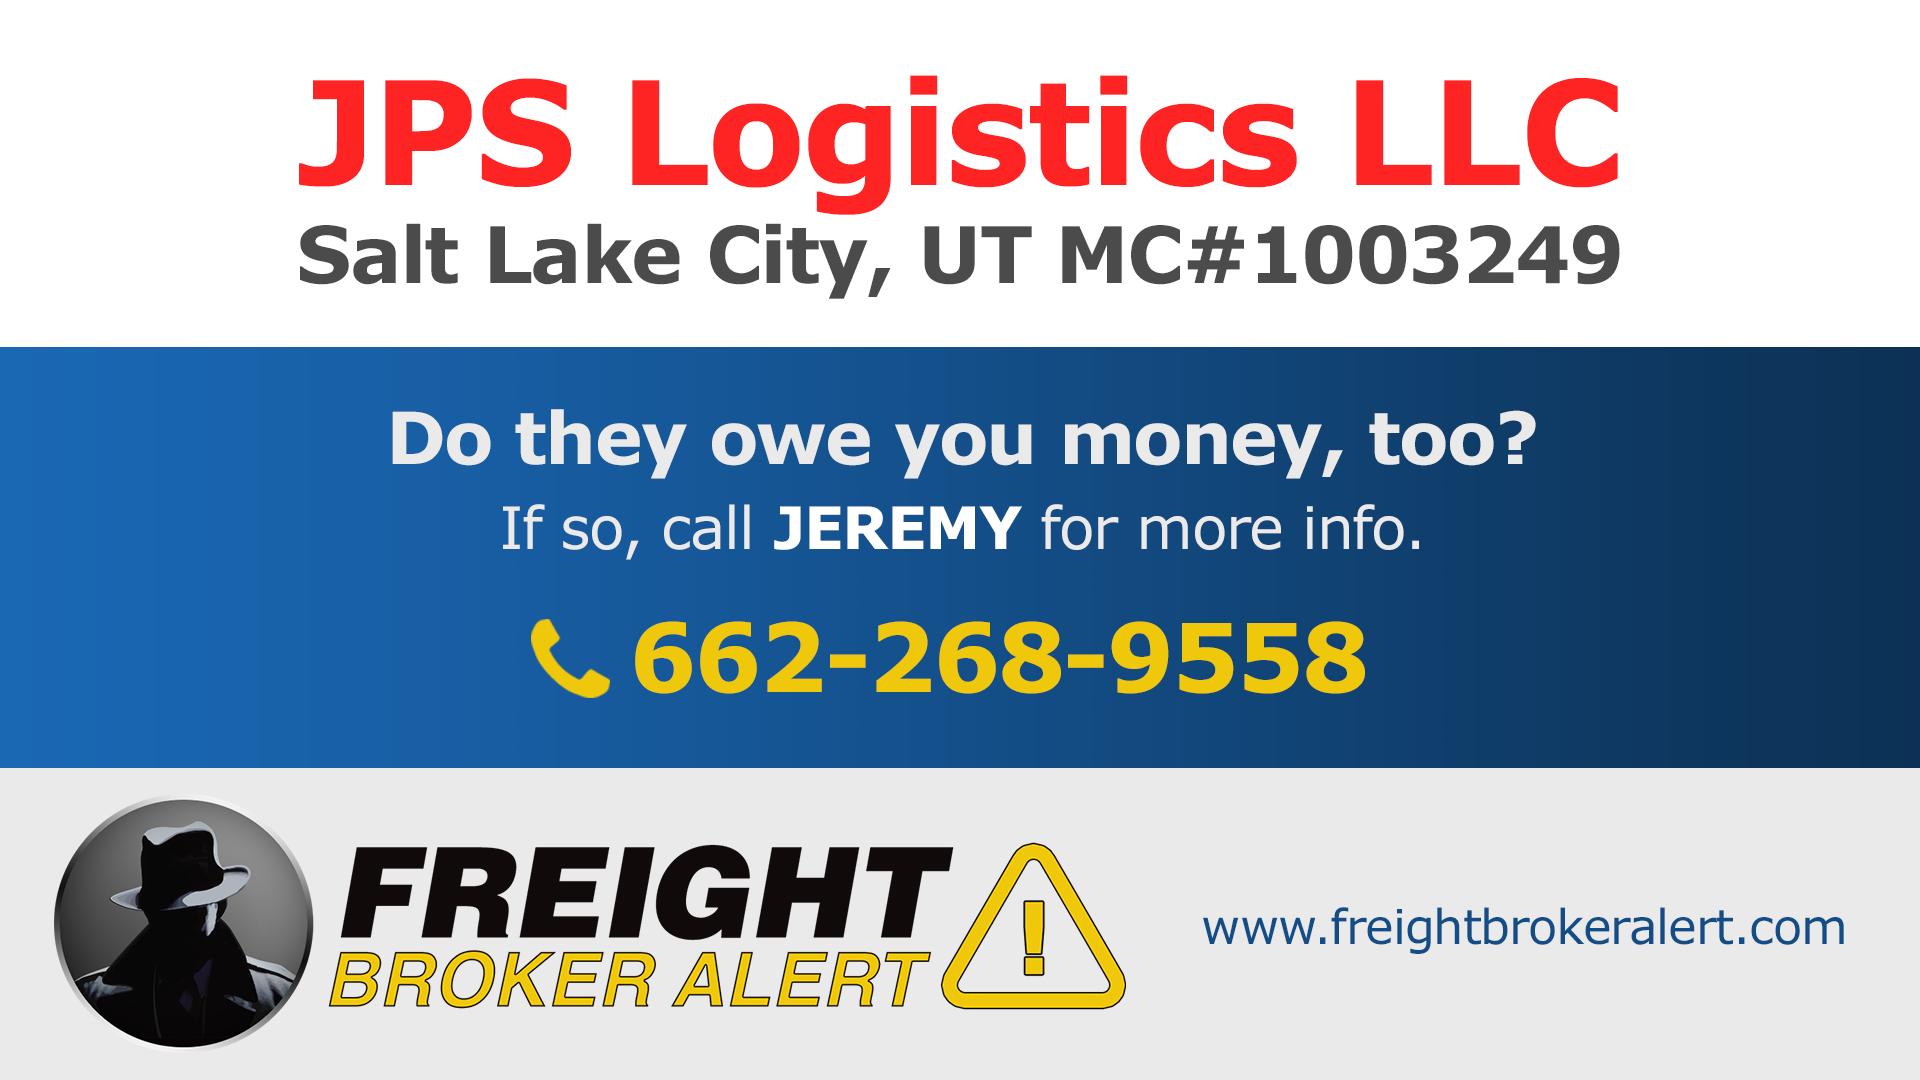 JPS Logistics LLC Utah